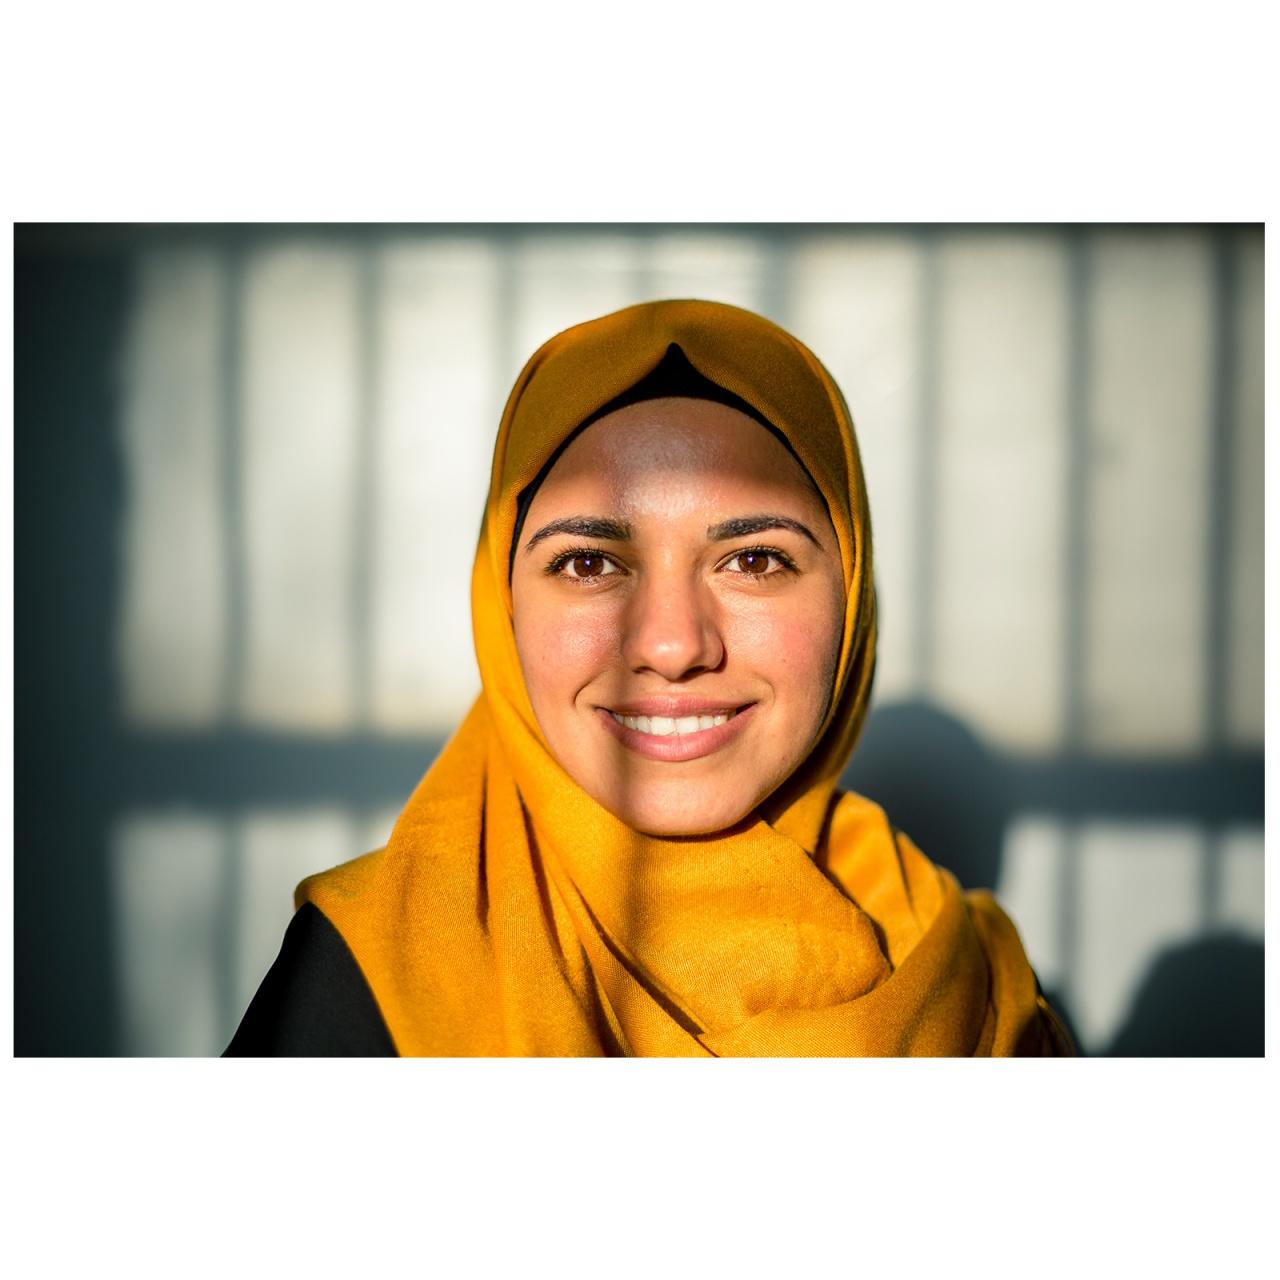 Syrian Refugee Student